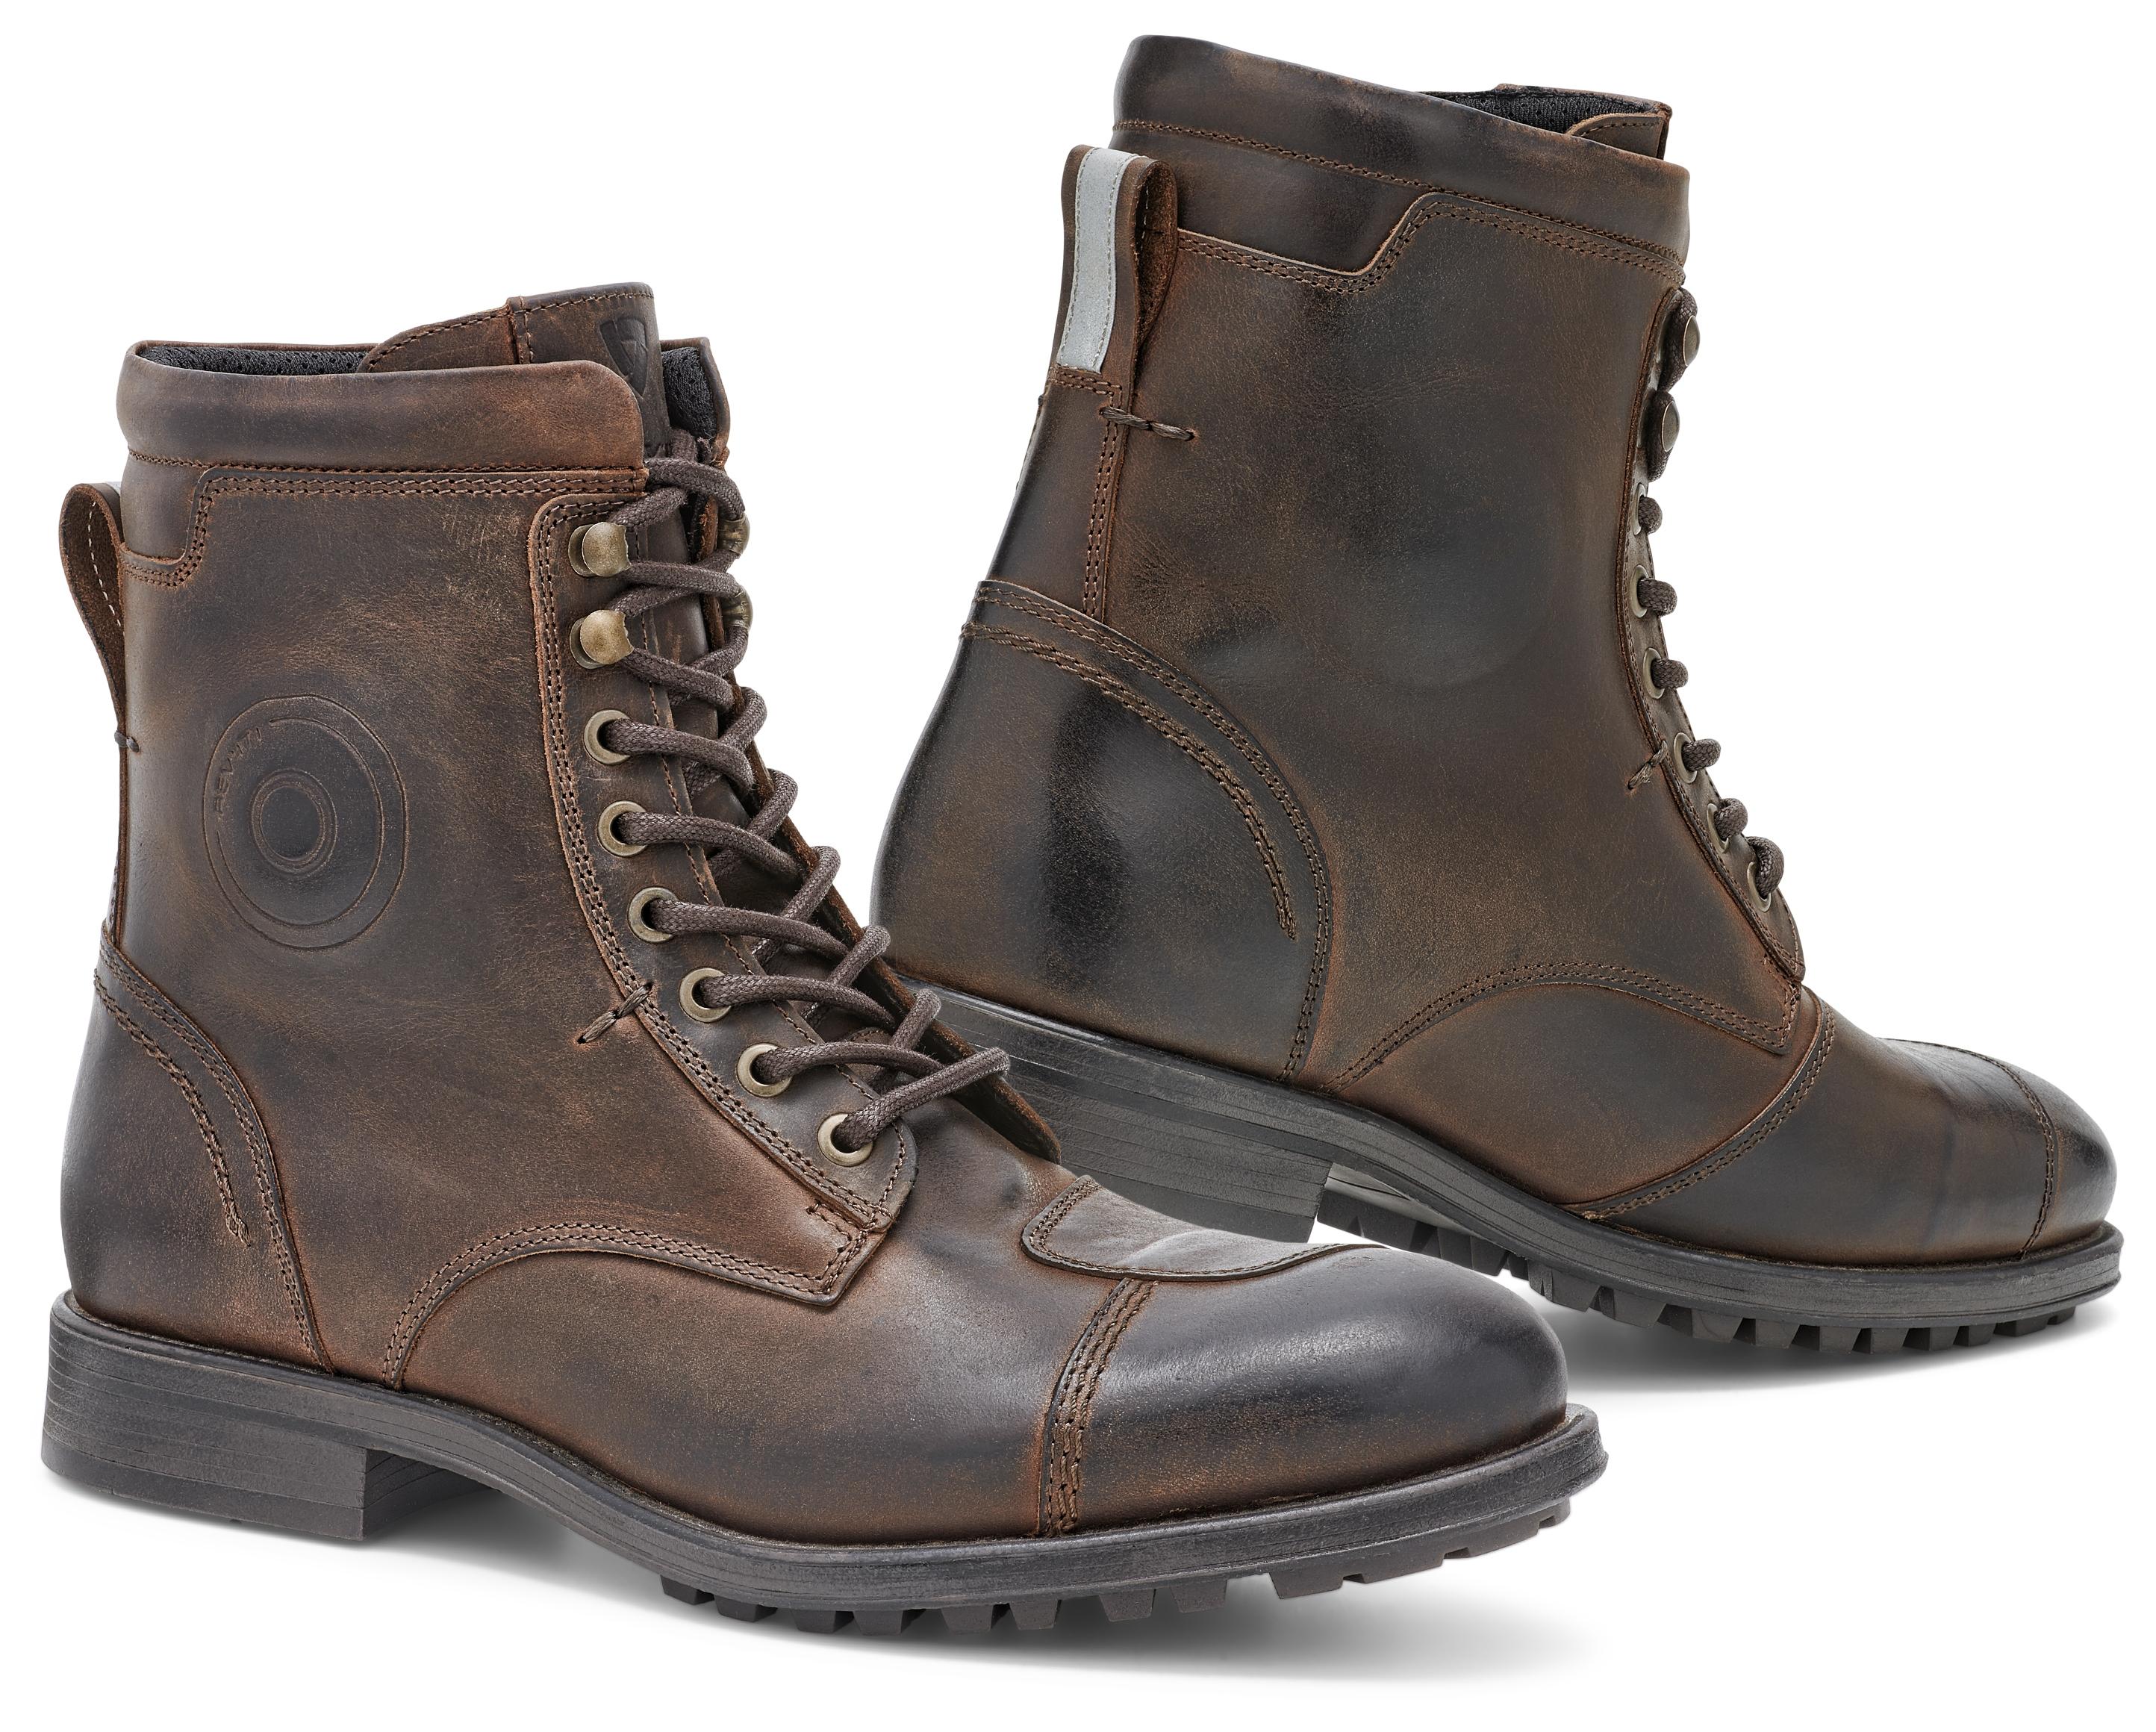 REV'IT! Marshall Boots